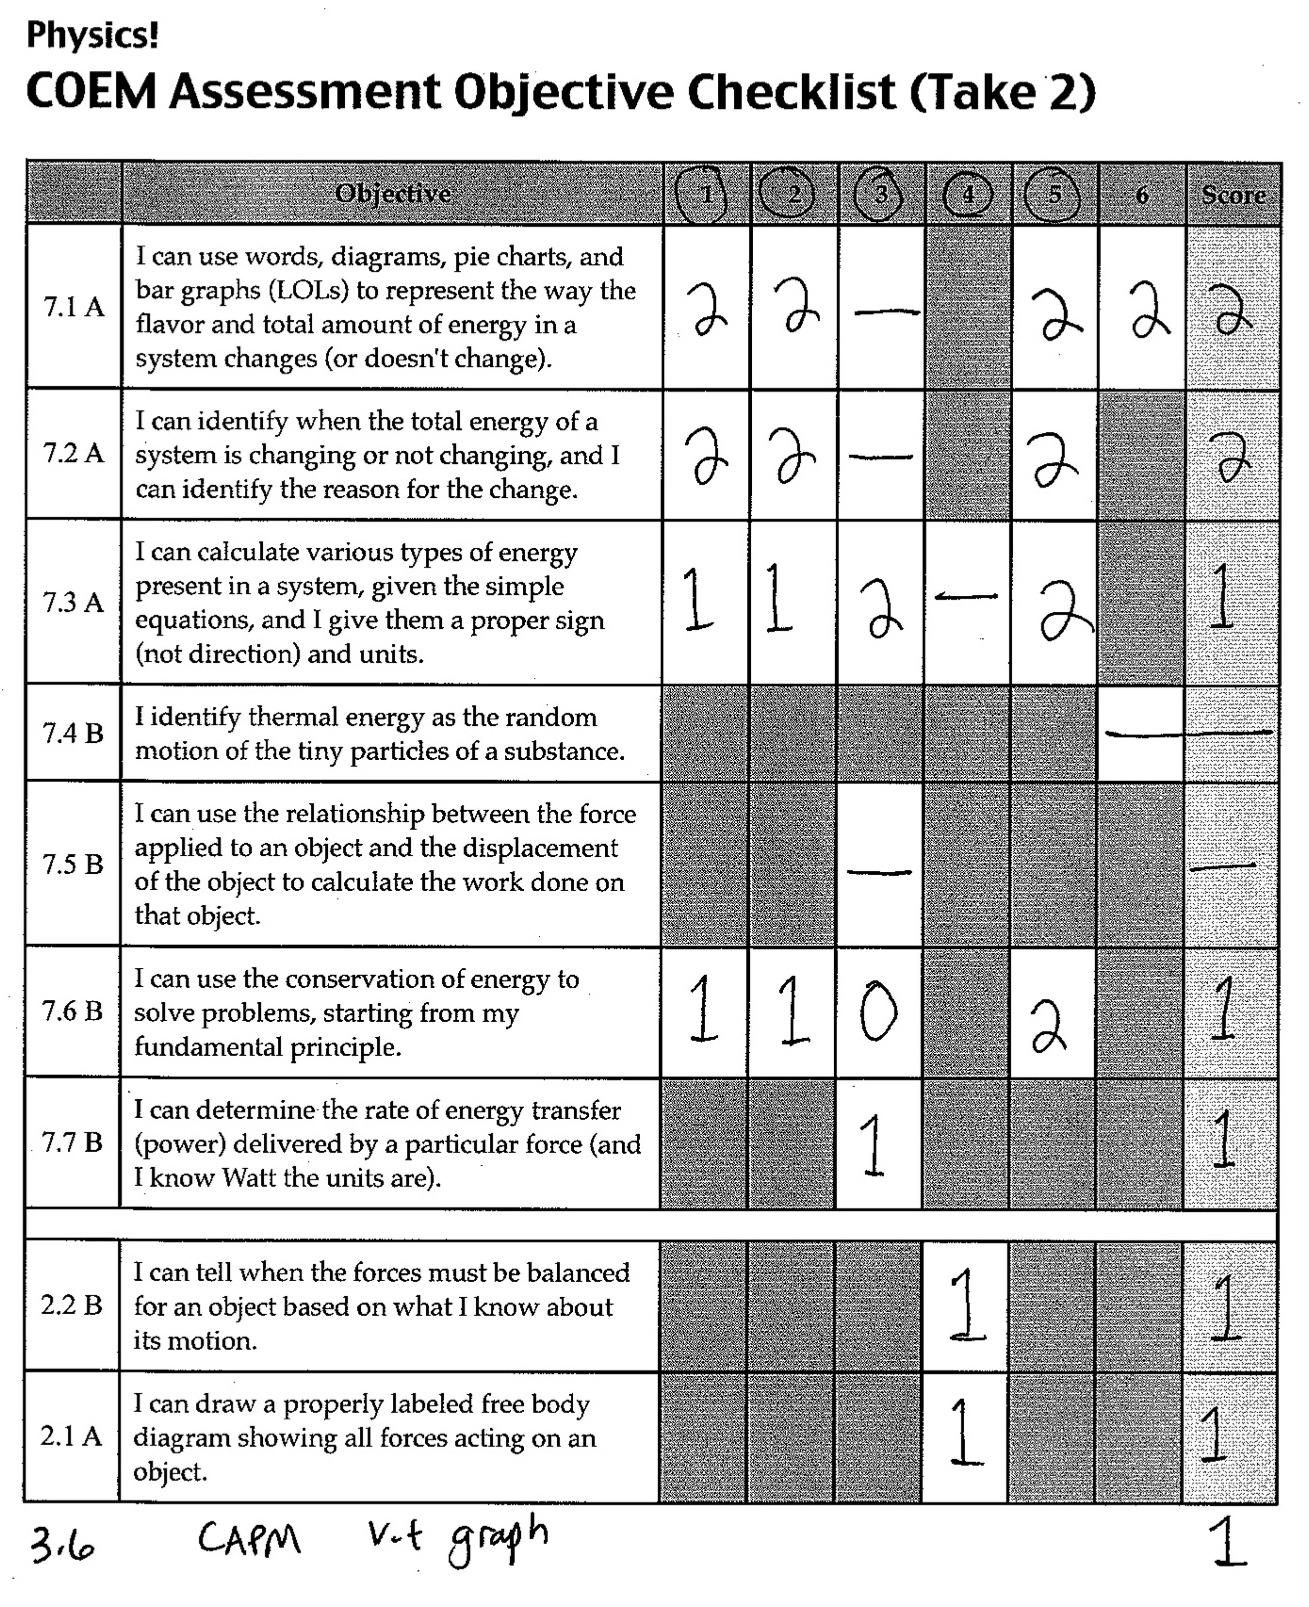 Test Grading Sheet a Grading Sheet From Last